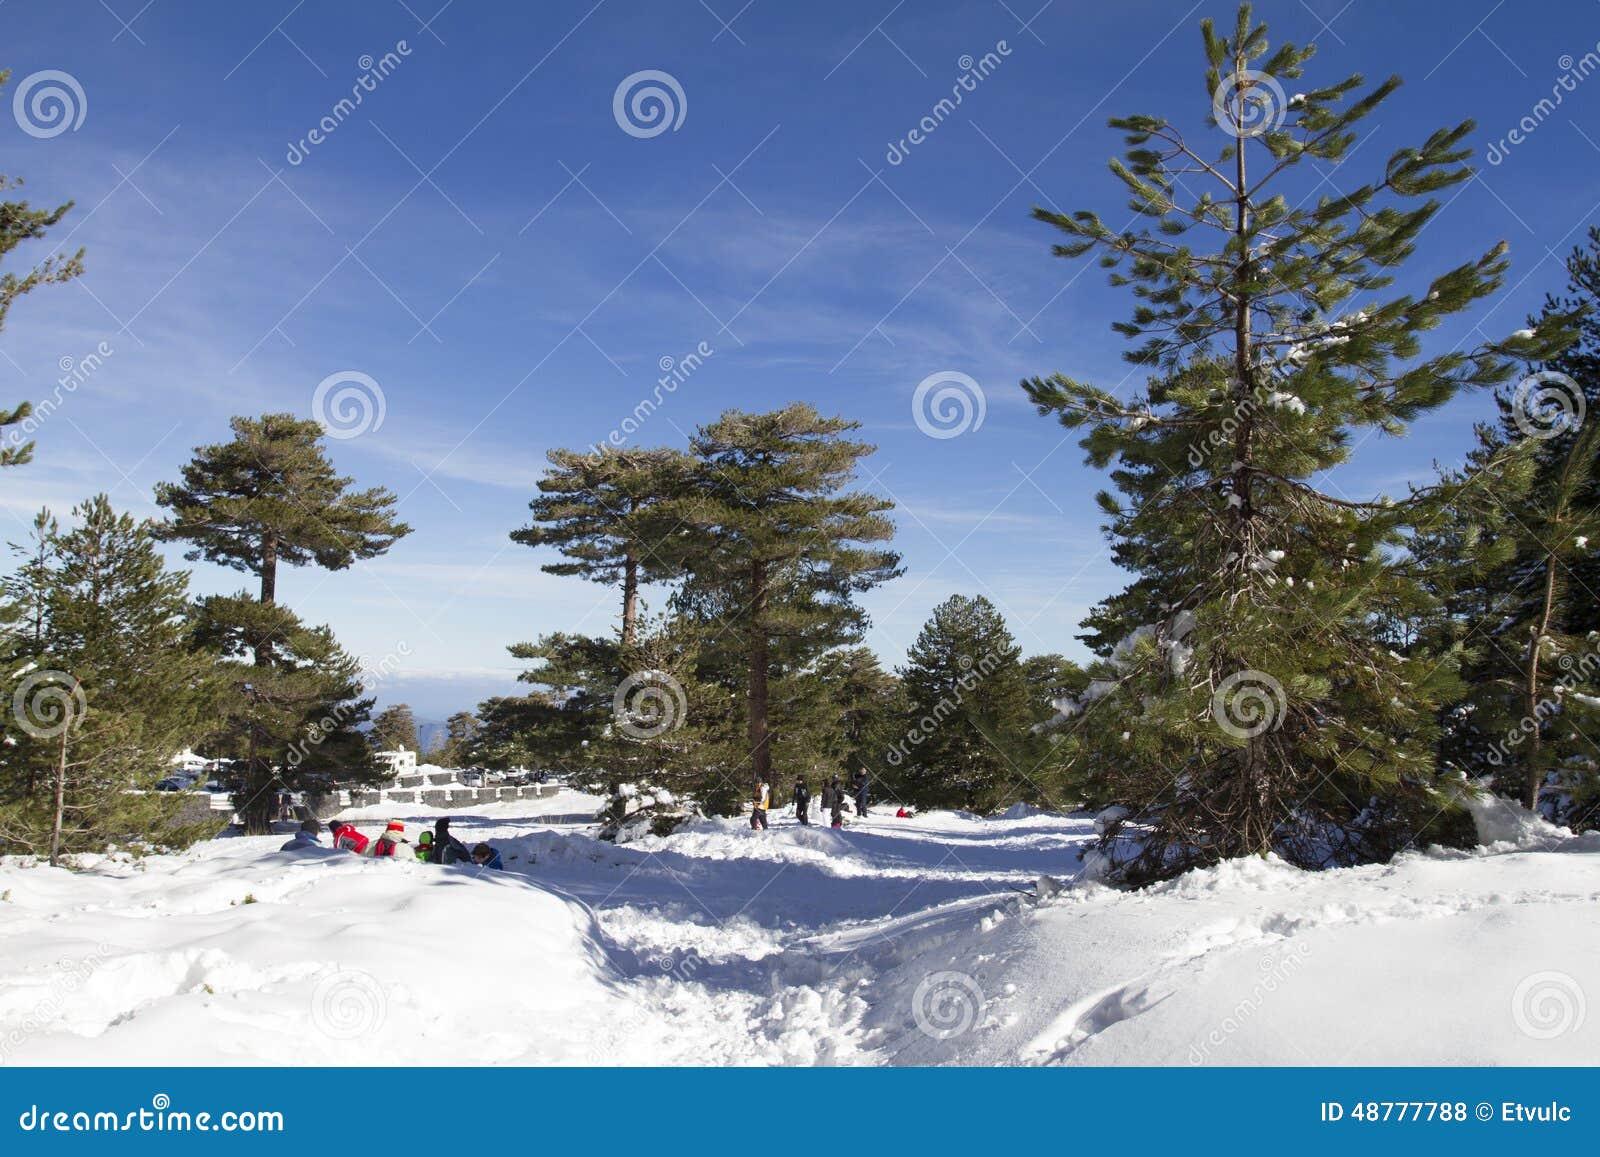 Winter Etna north